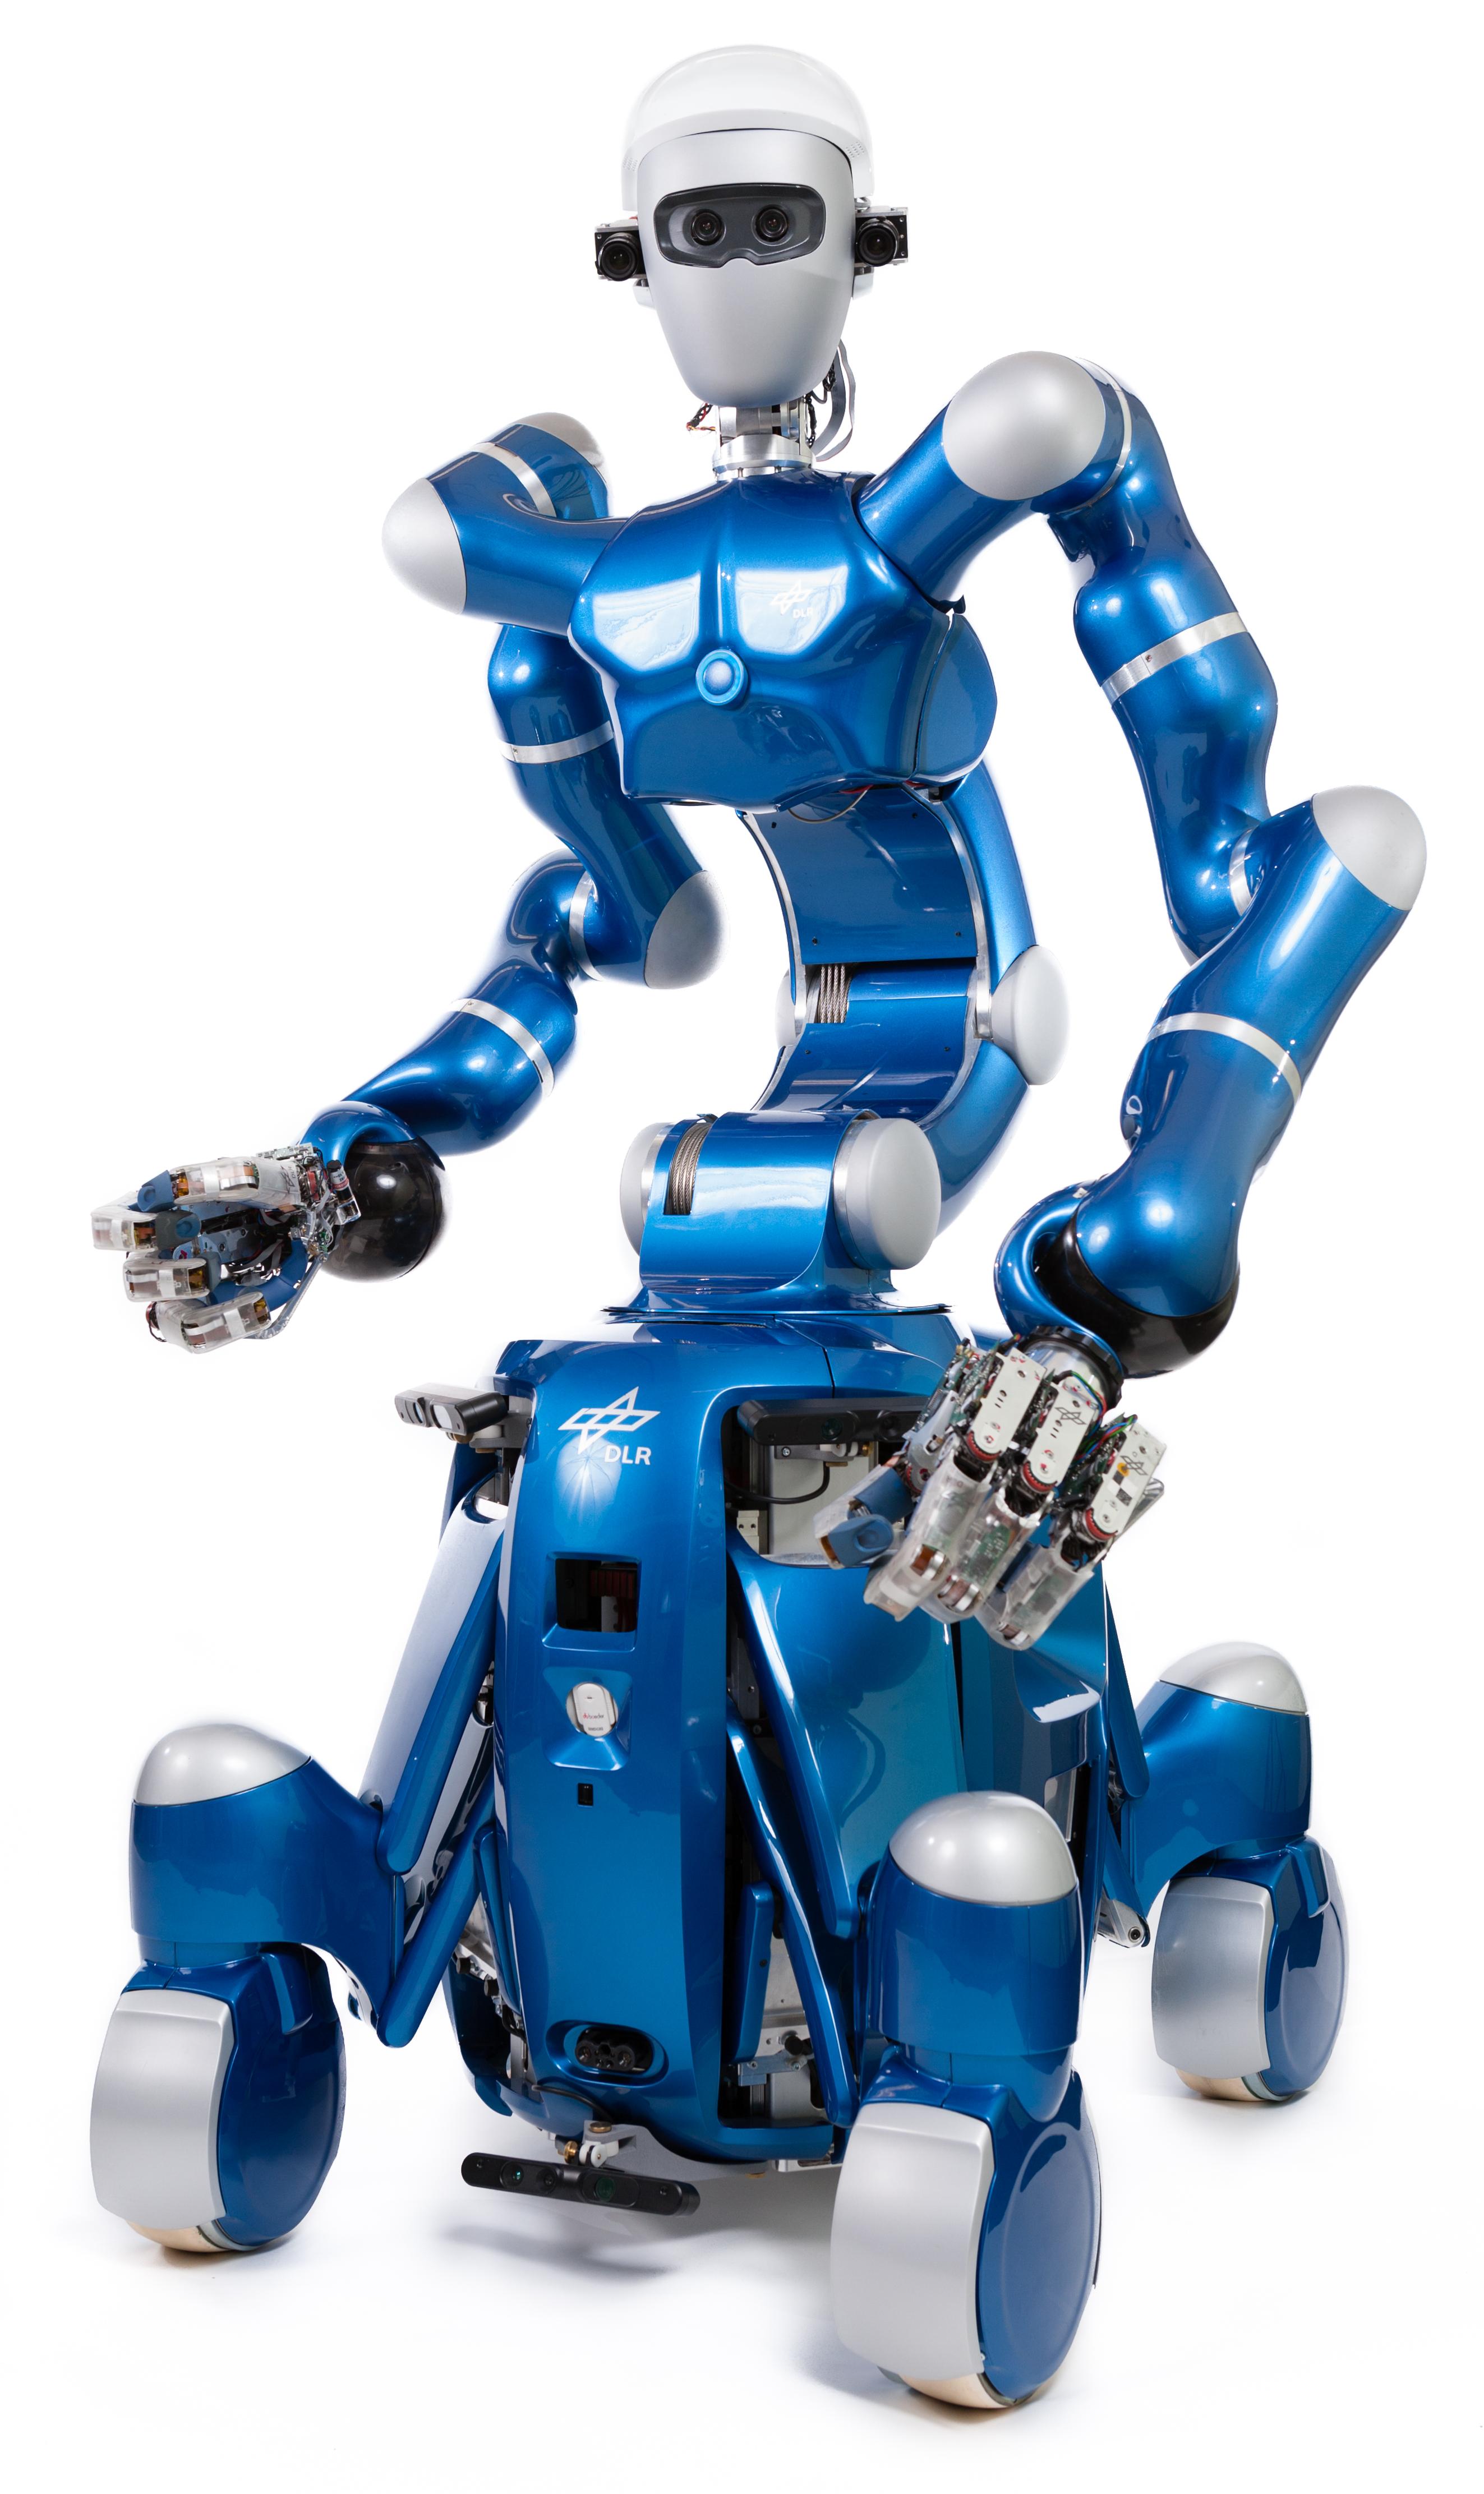 DLR - Institute of Robotics and Mechatronics - Rollin' Justin